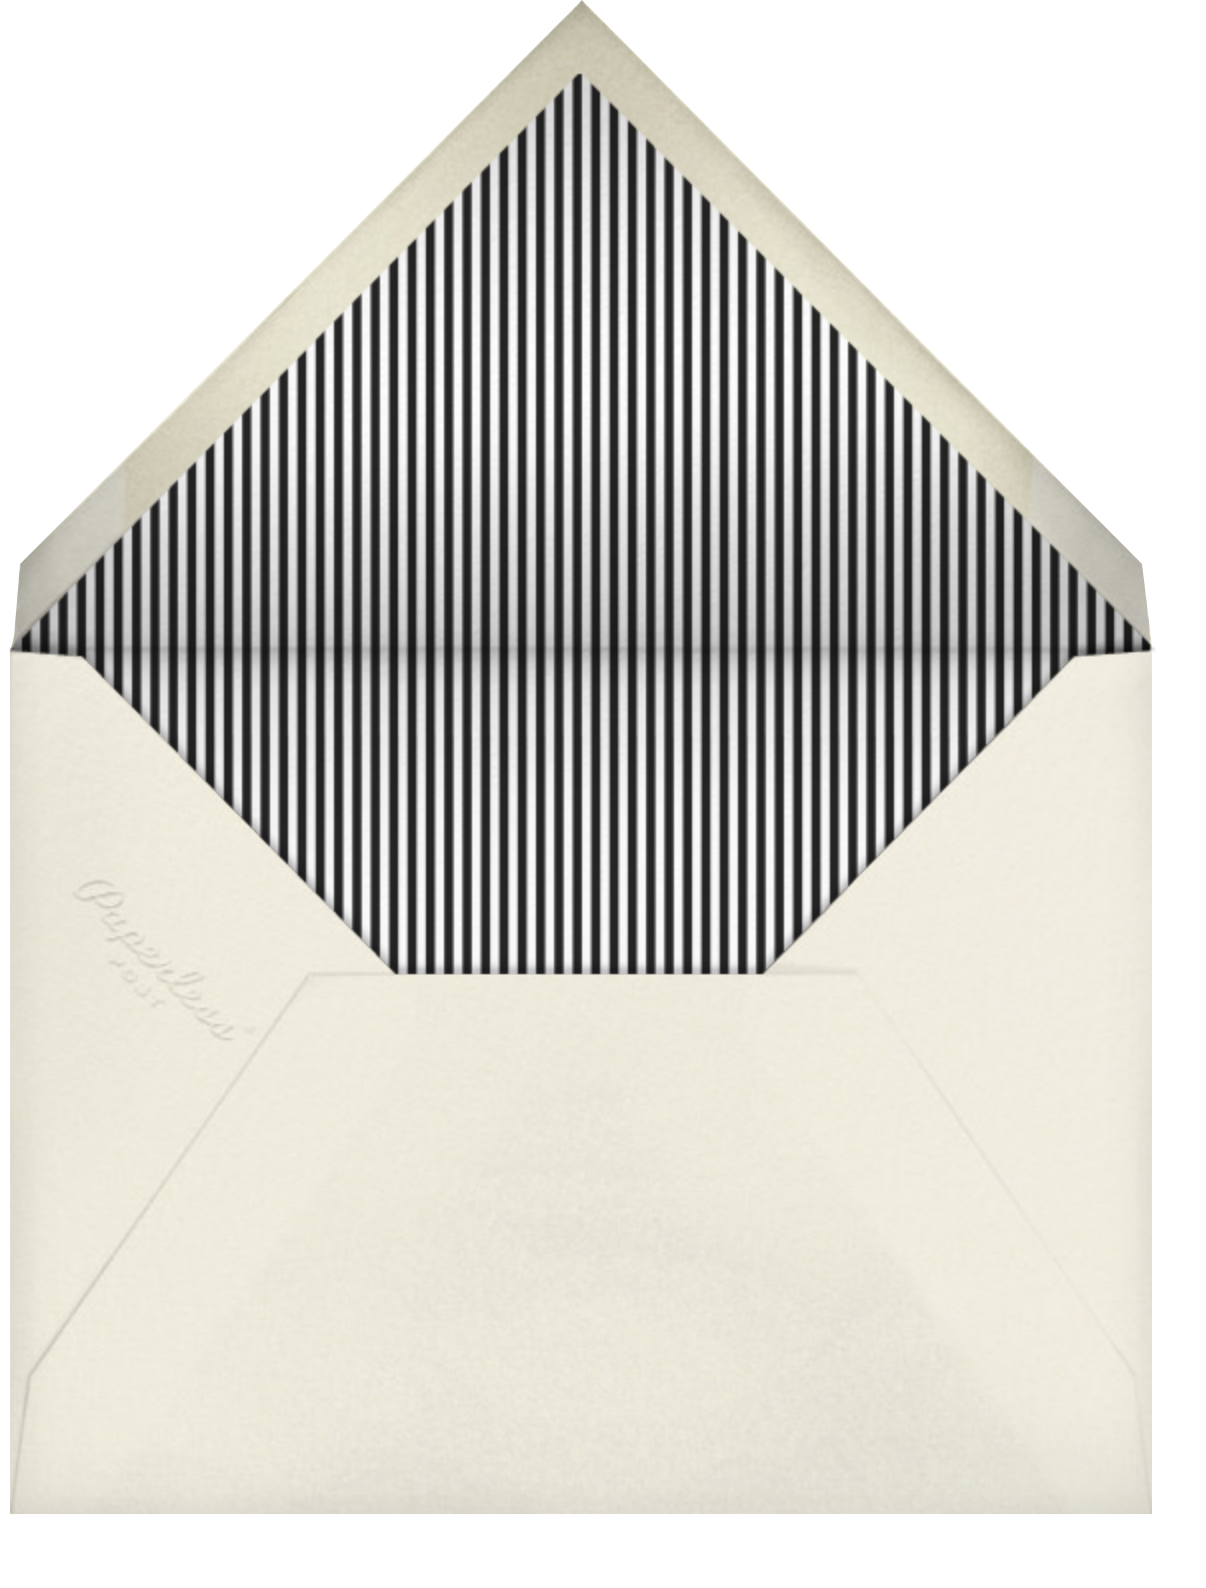 Floral Collage Photo - kate spade new york - Printable invitations - envelope back